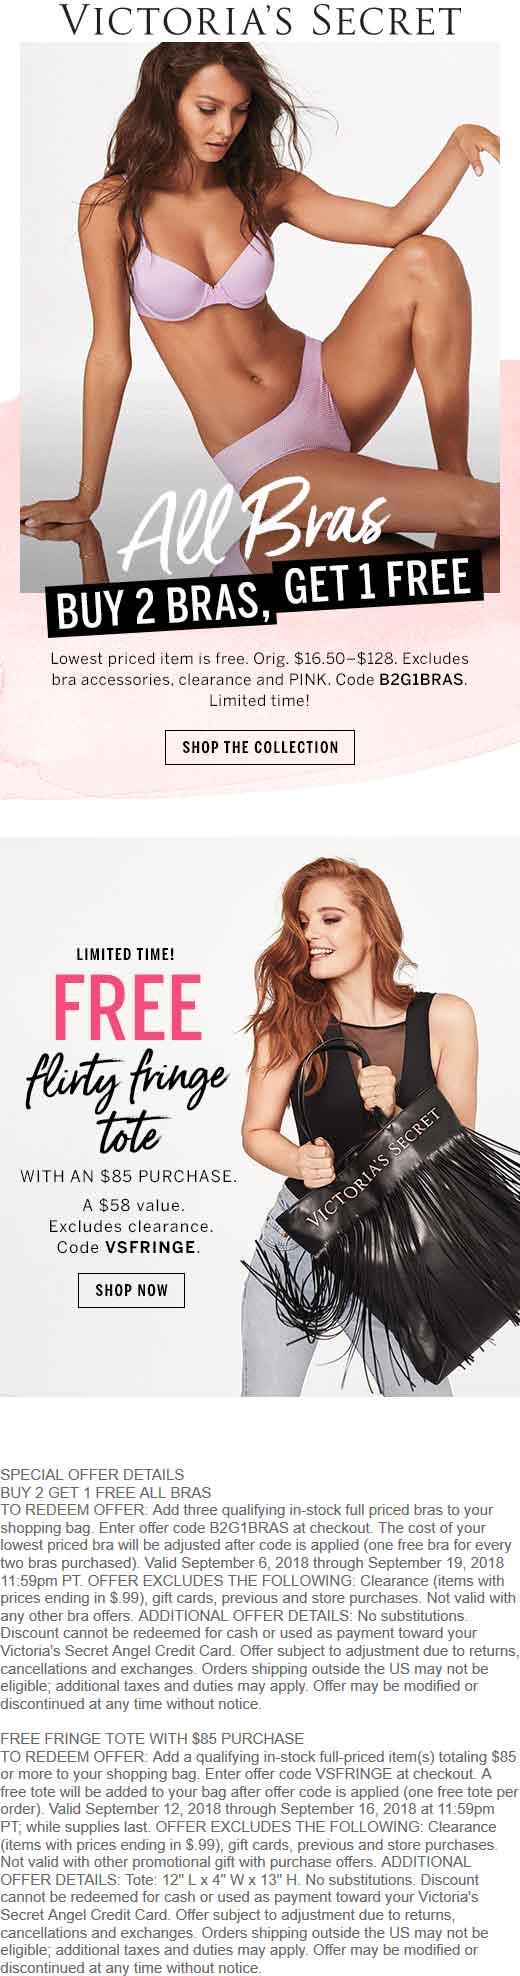 Victorias Secret coupons & promo code for [February 2020]